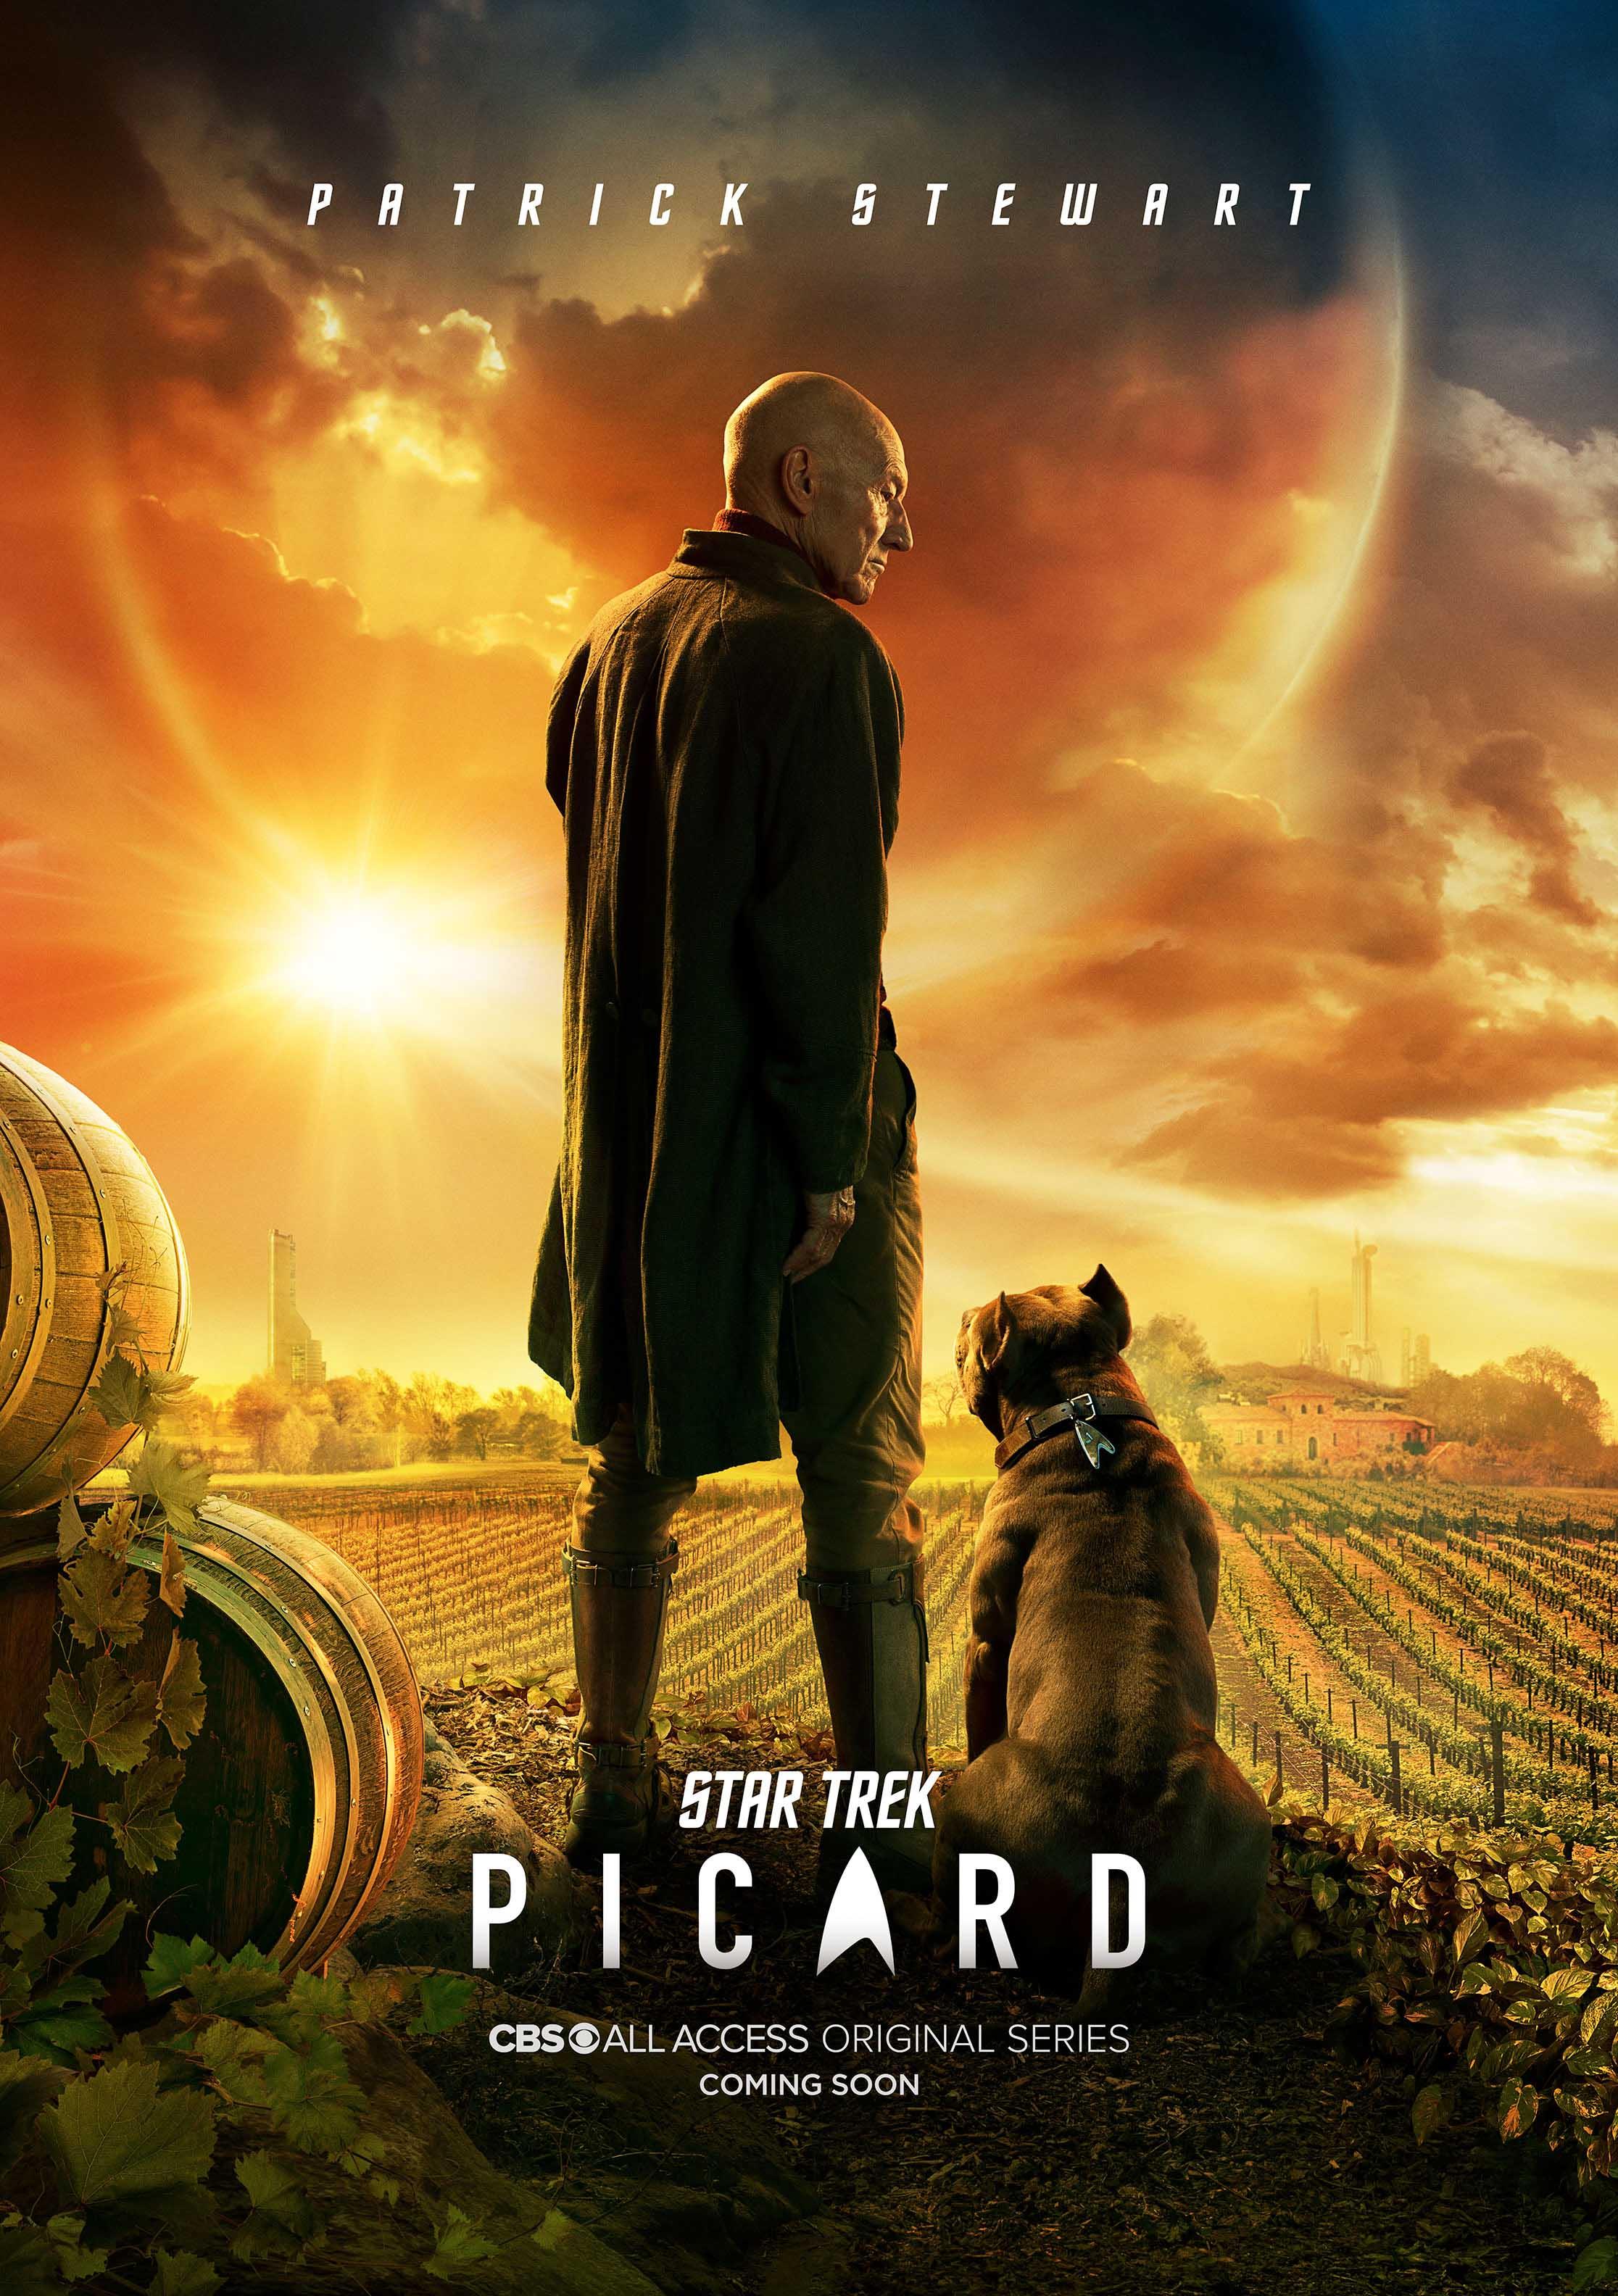 Star.Trek.Picard.S01E10.iTALiAN.MULTi.1080p.WEBRip.x264-HWD